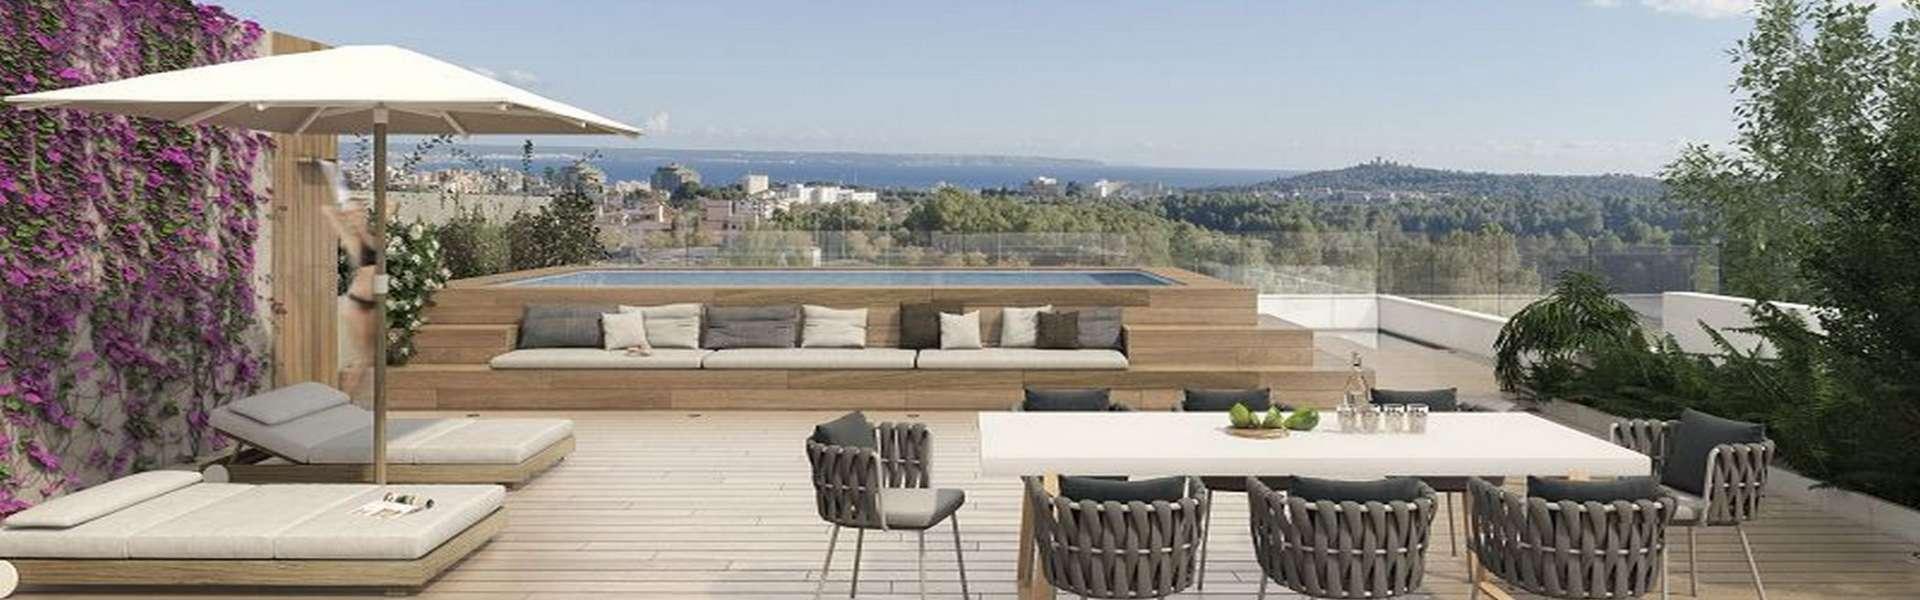 Palma/Golfplatz Son Quint - Apartments/Penthäuser in Traumlage